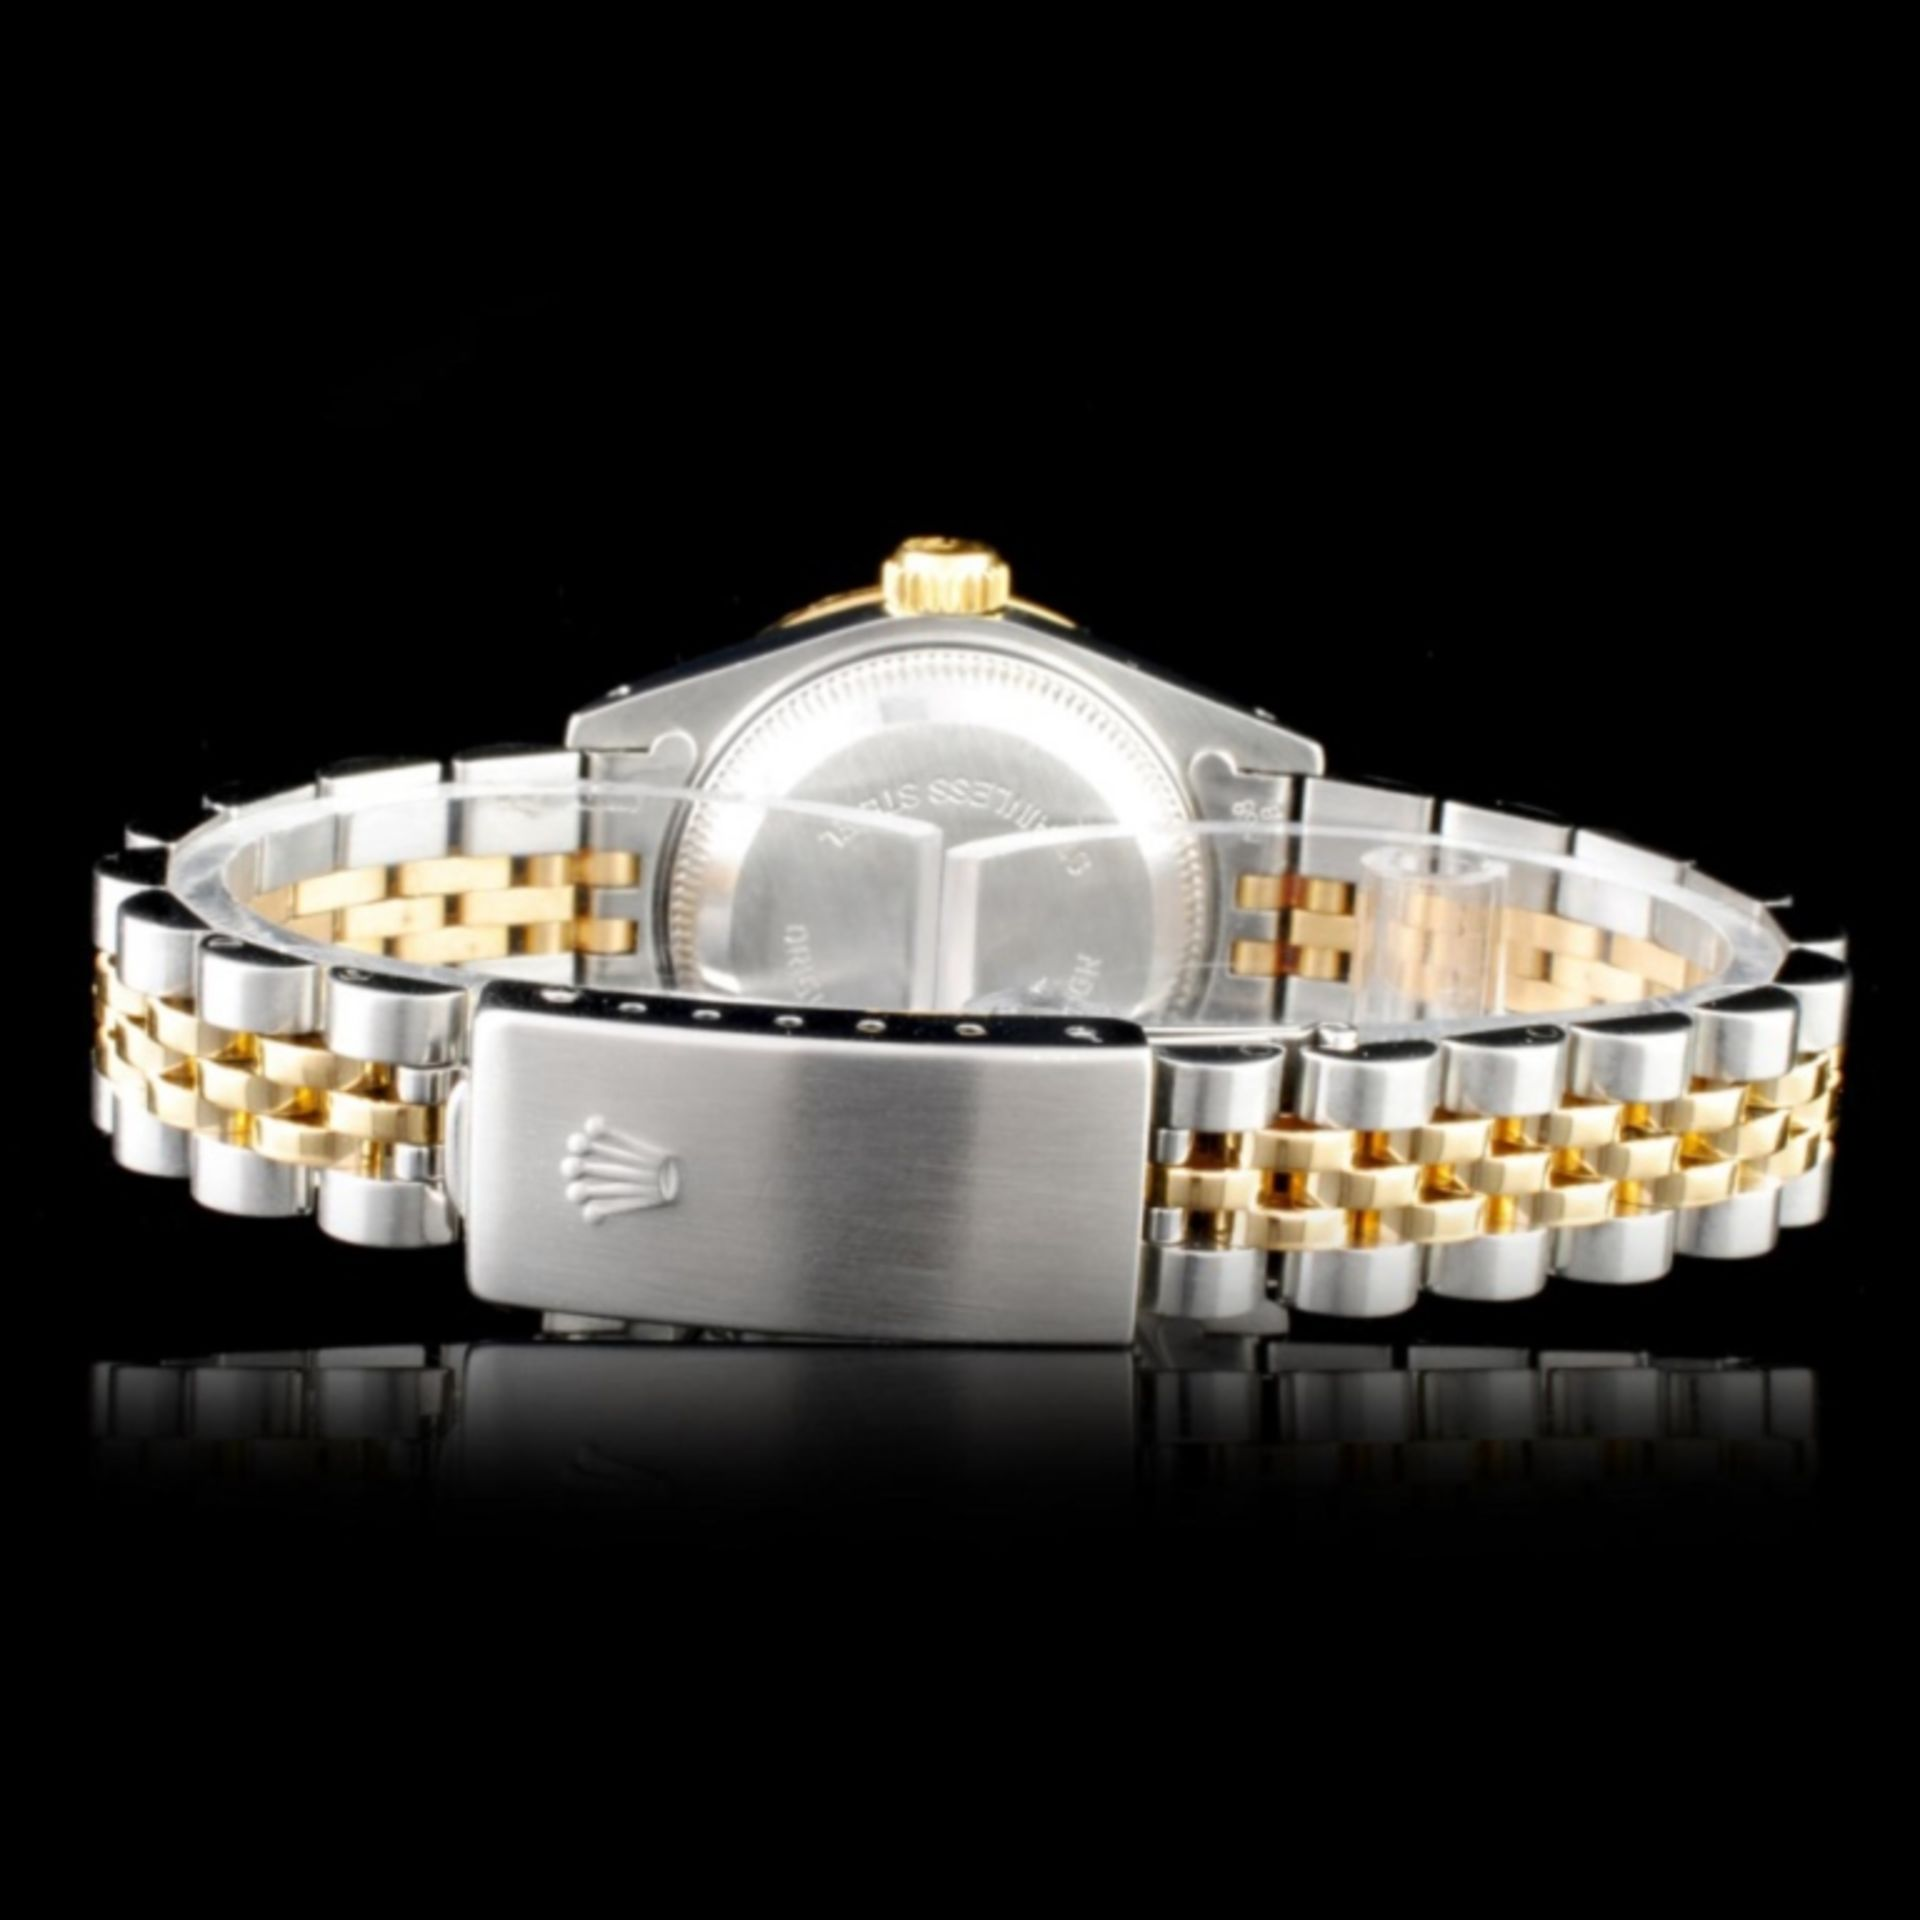 Rolex YG/SS DateJust Ladies Diamond Wristwatch - Image 3 of 5